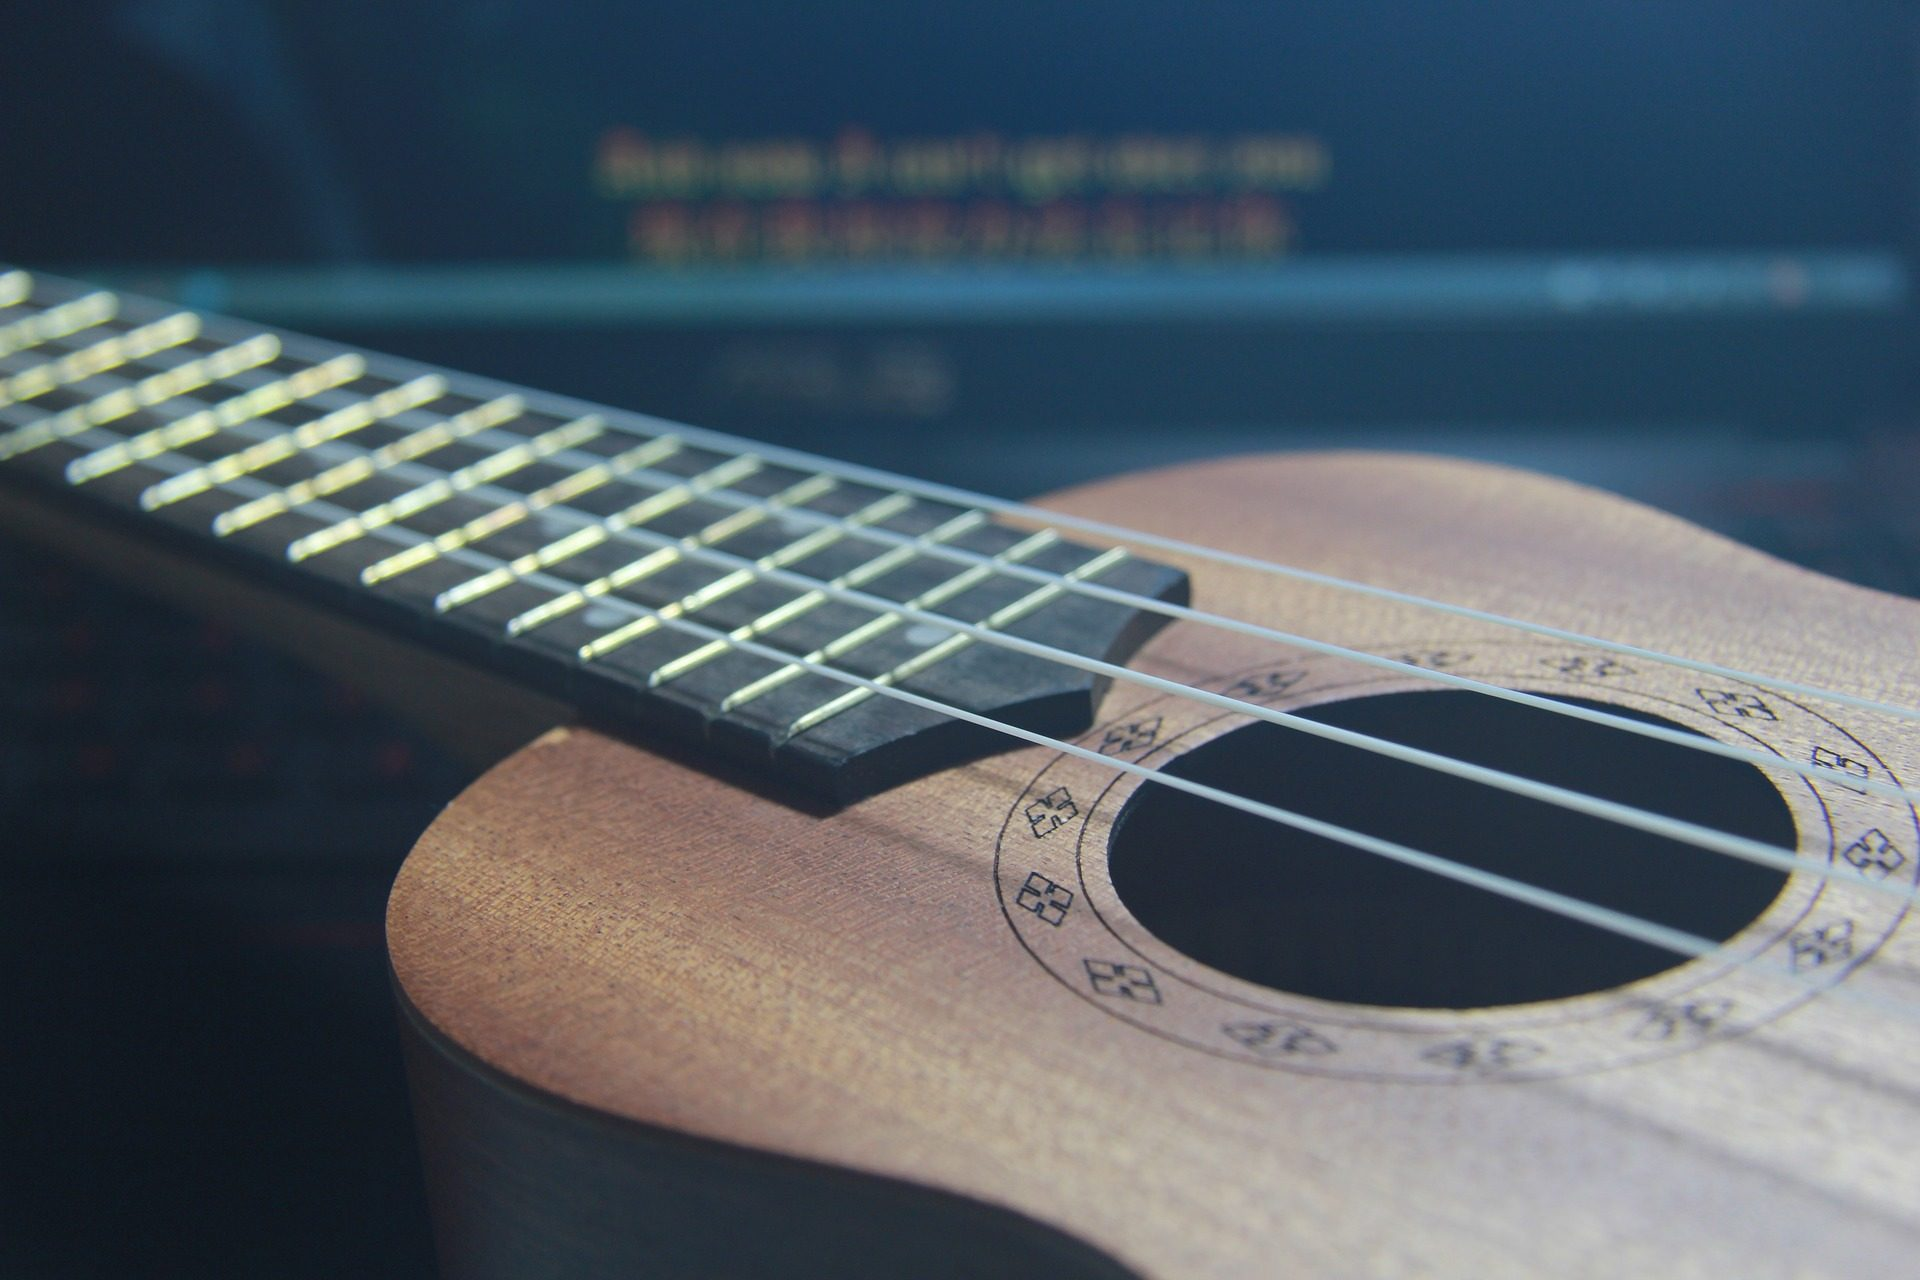 Гитара, строки, Мачта, звуки, песни - Обои HD - Профессор falken.com